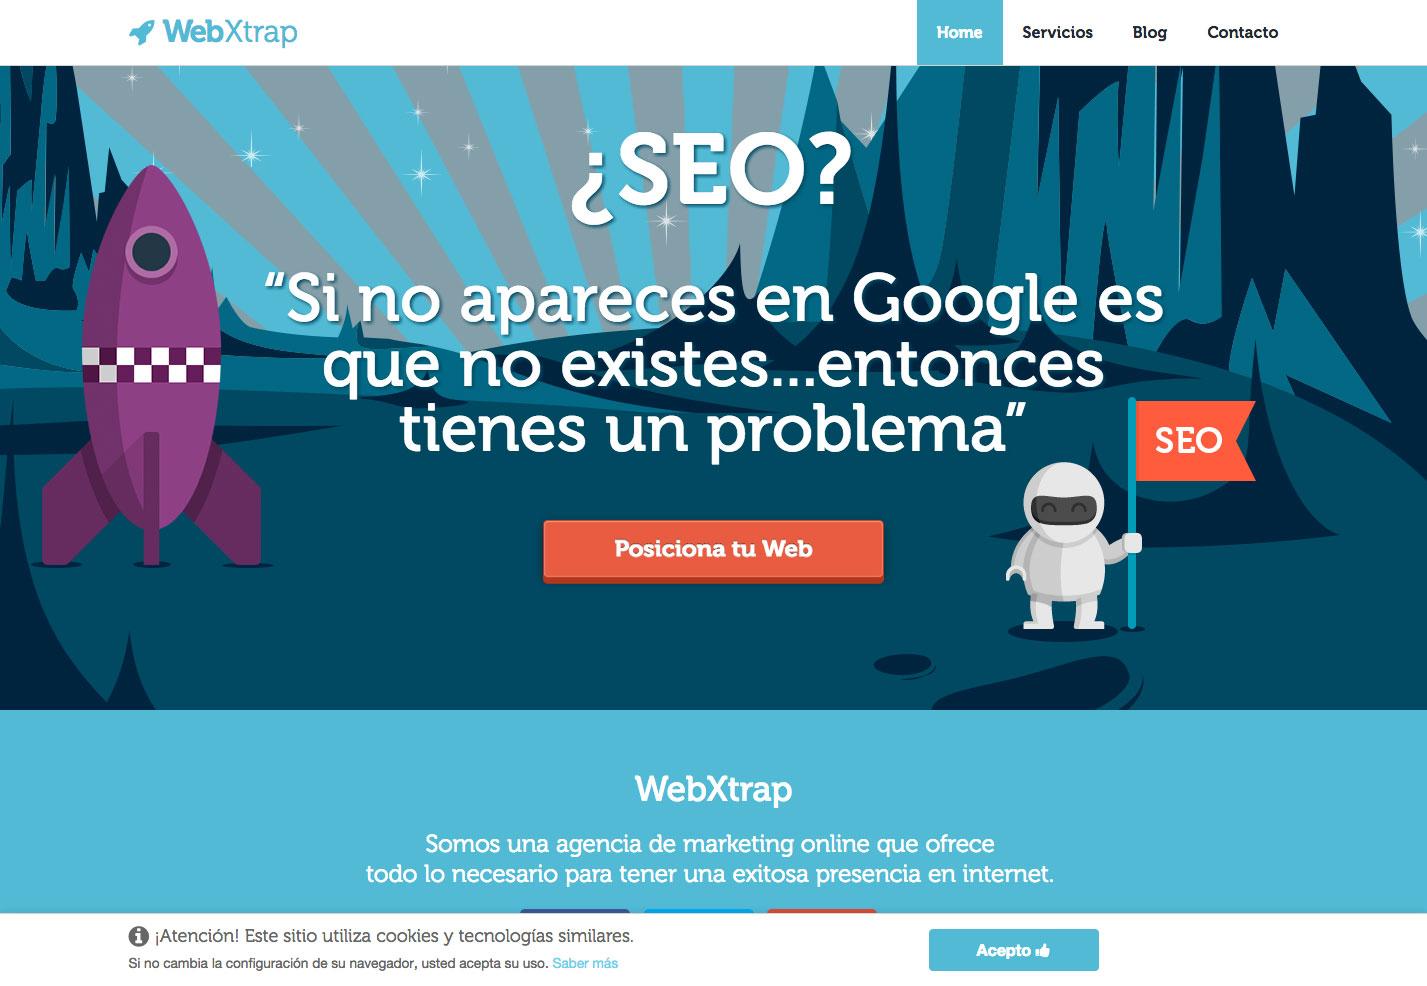 webxtrap